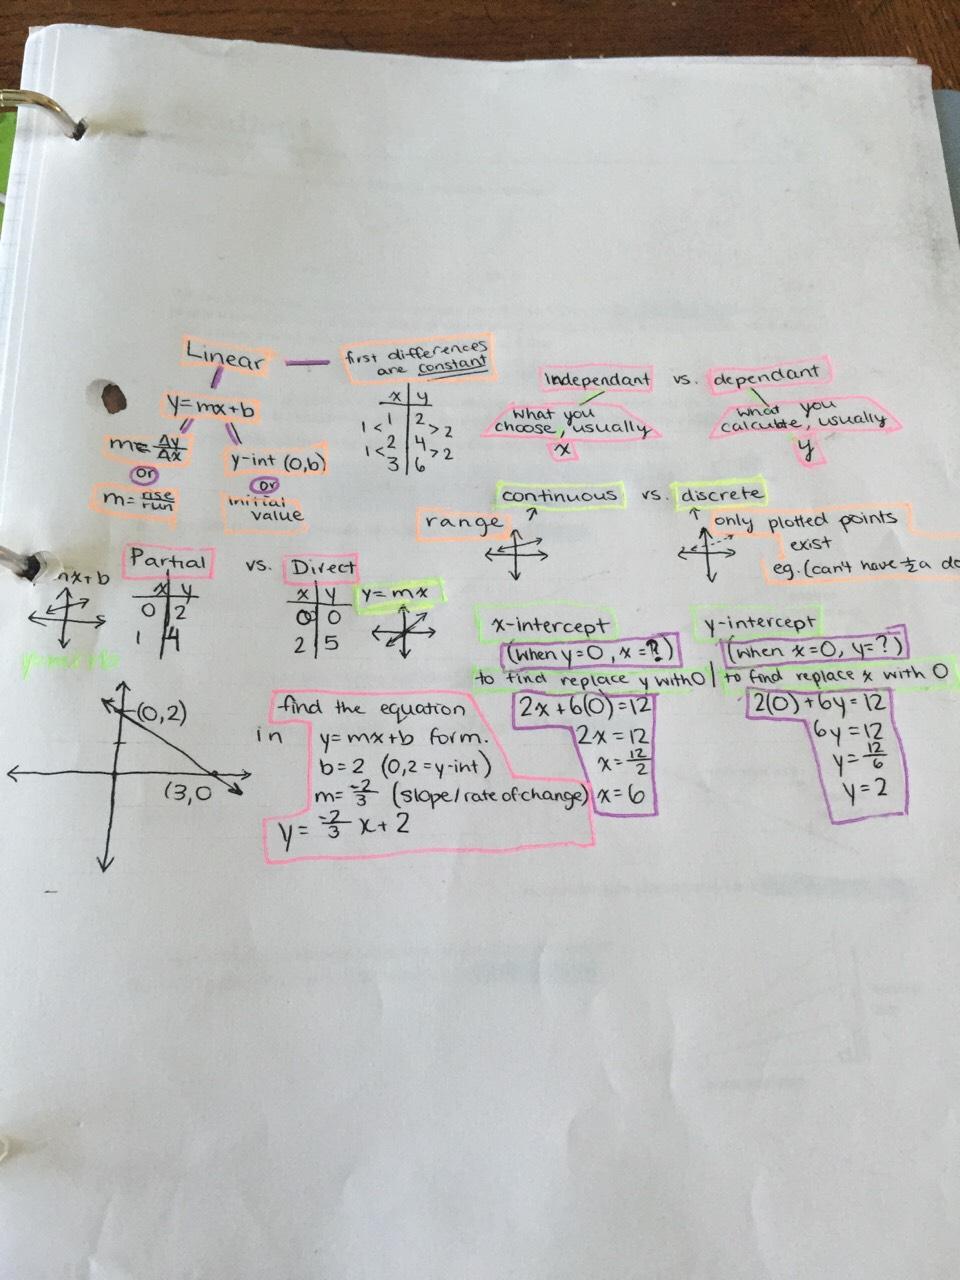 Color code information